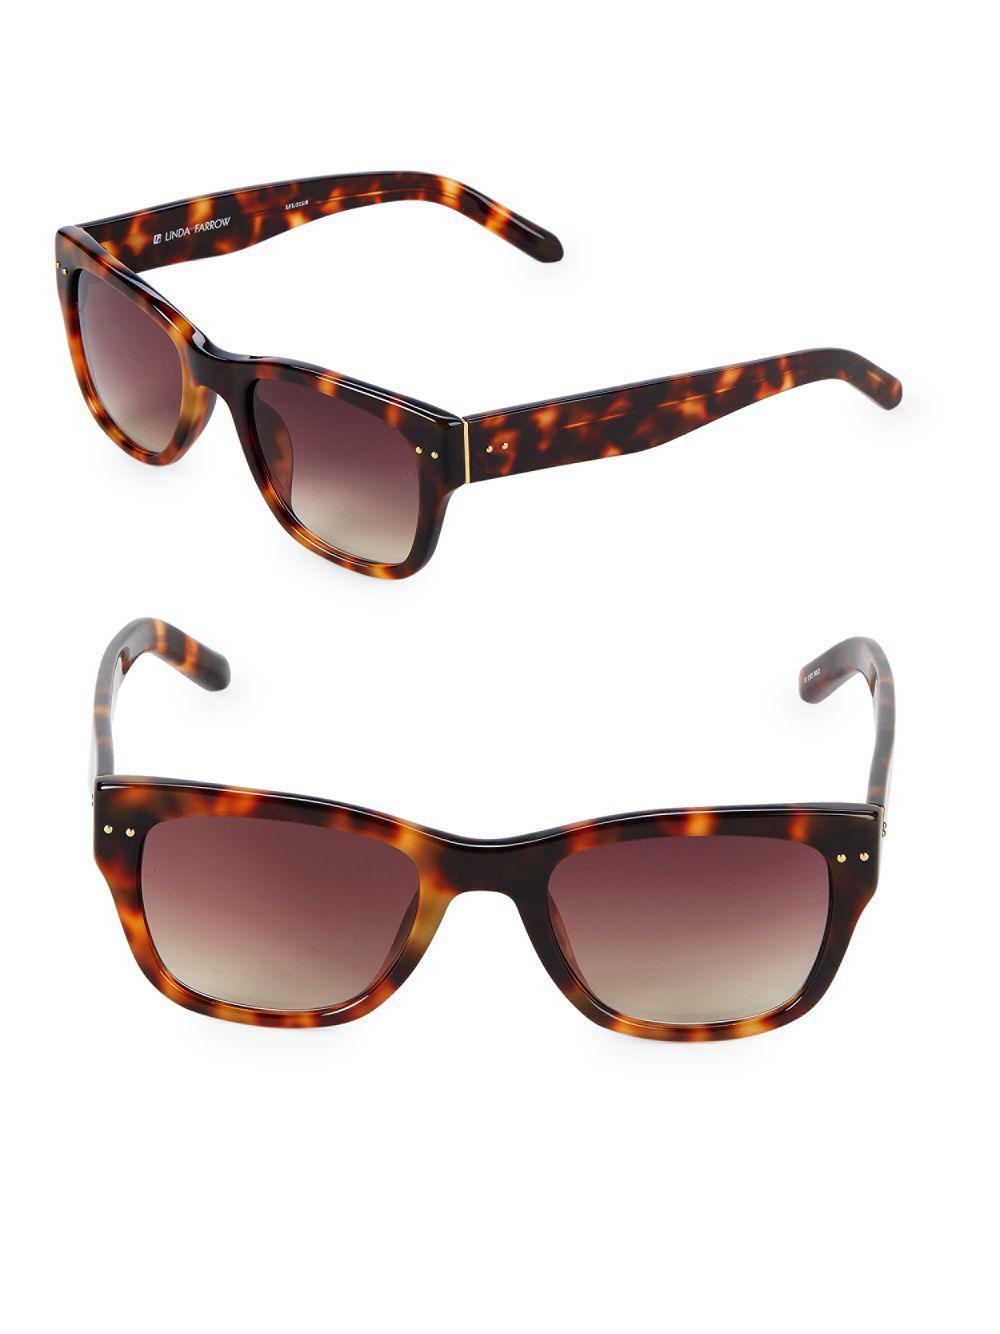 4ae2da0602 Linda Farrow - Brown 50mm Square Sunglasses - Lyst. View fullscreen